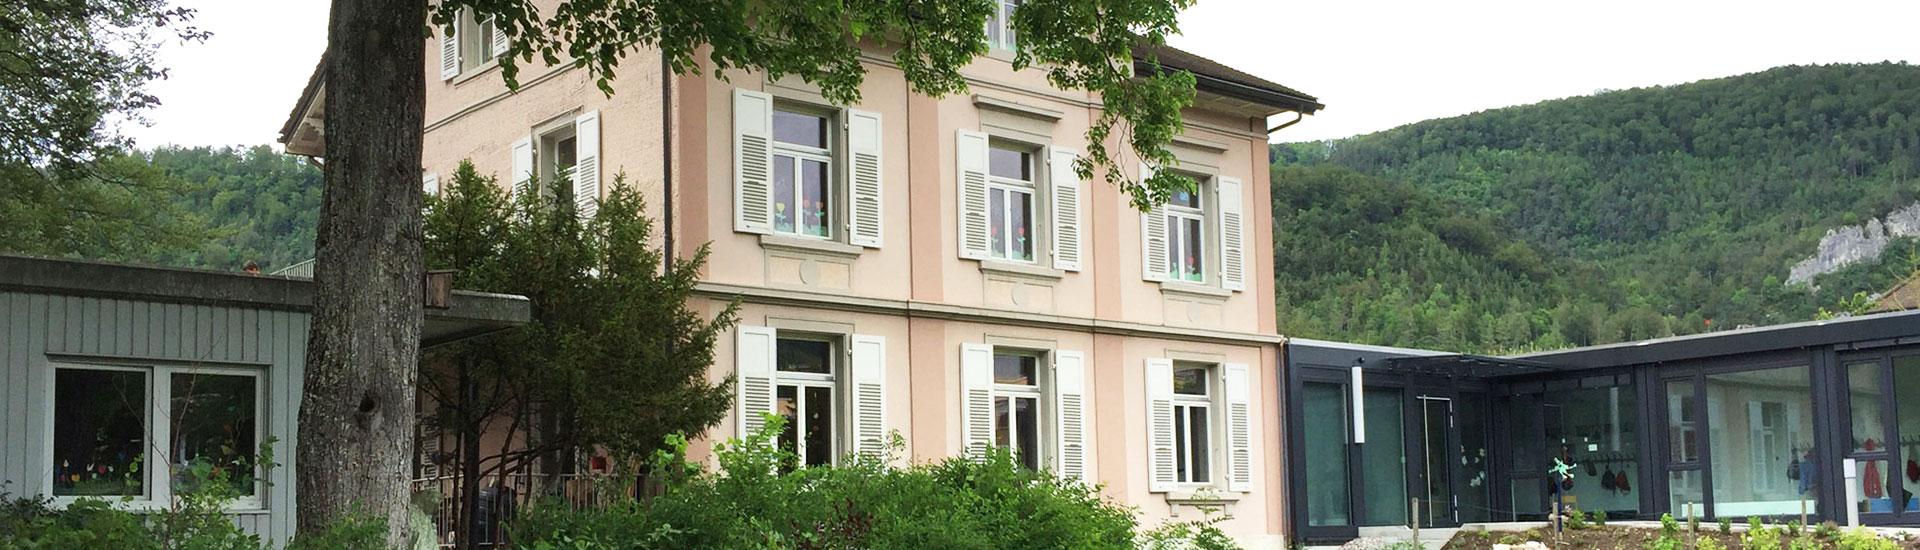 HPSZ Balsthal